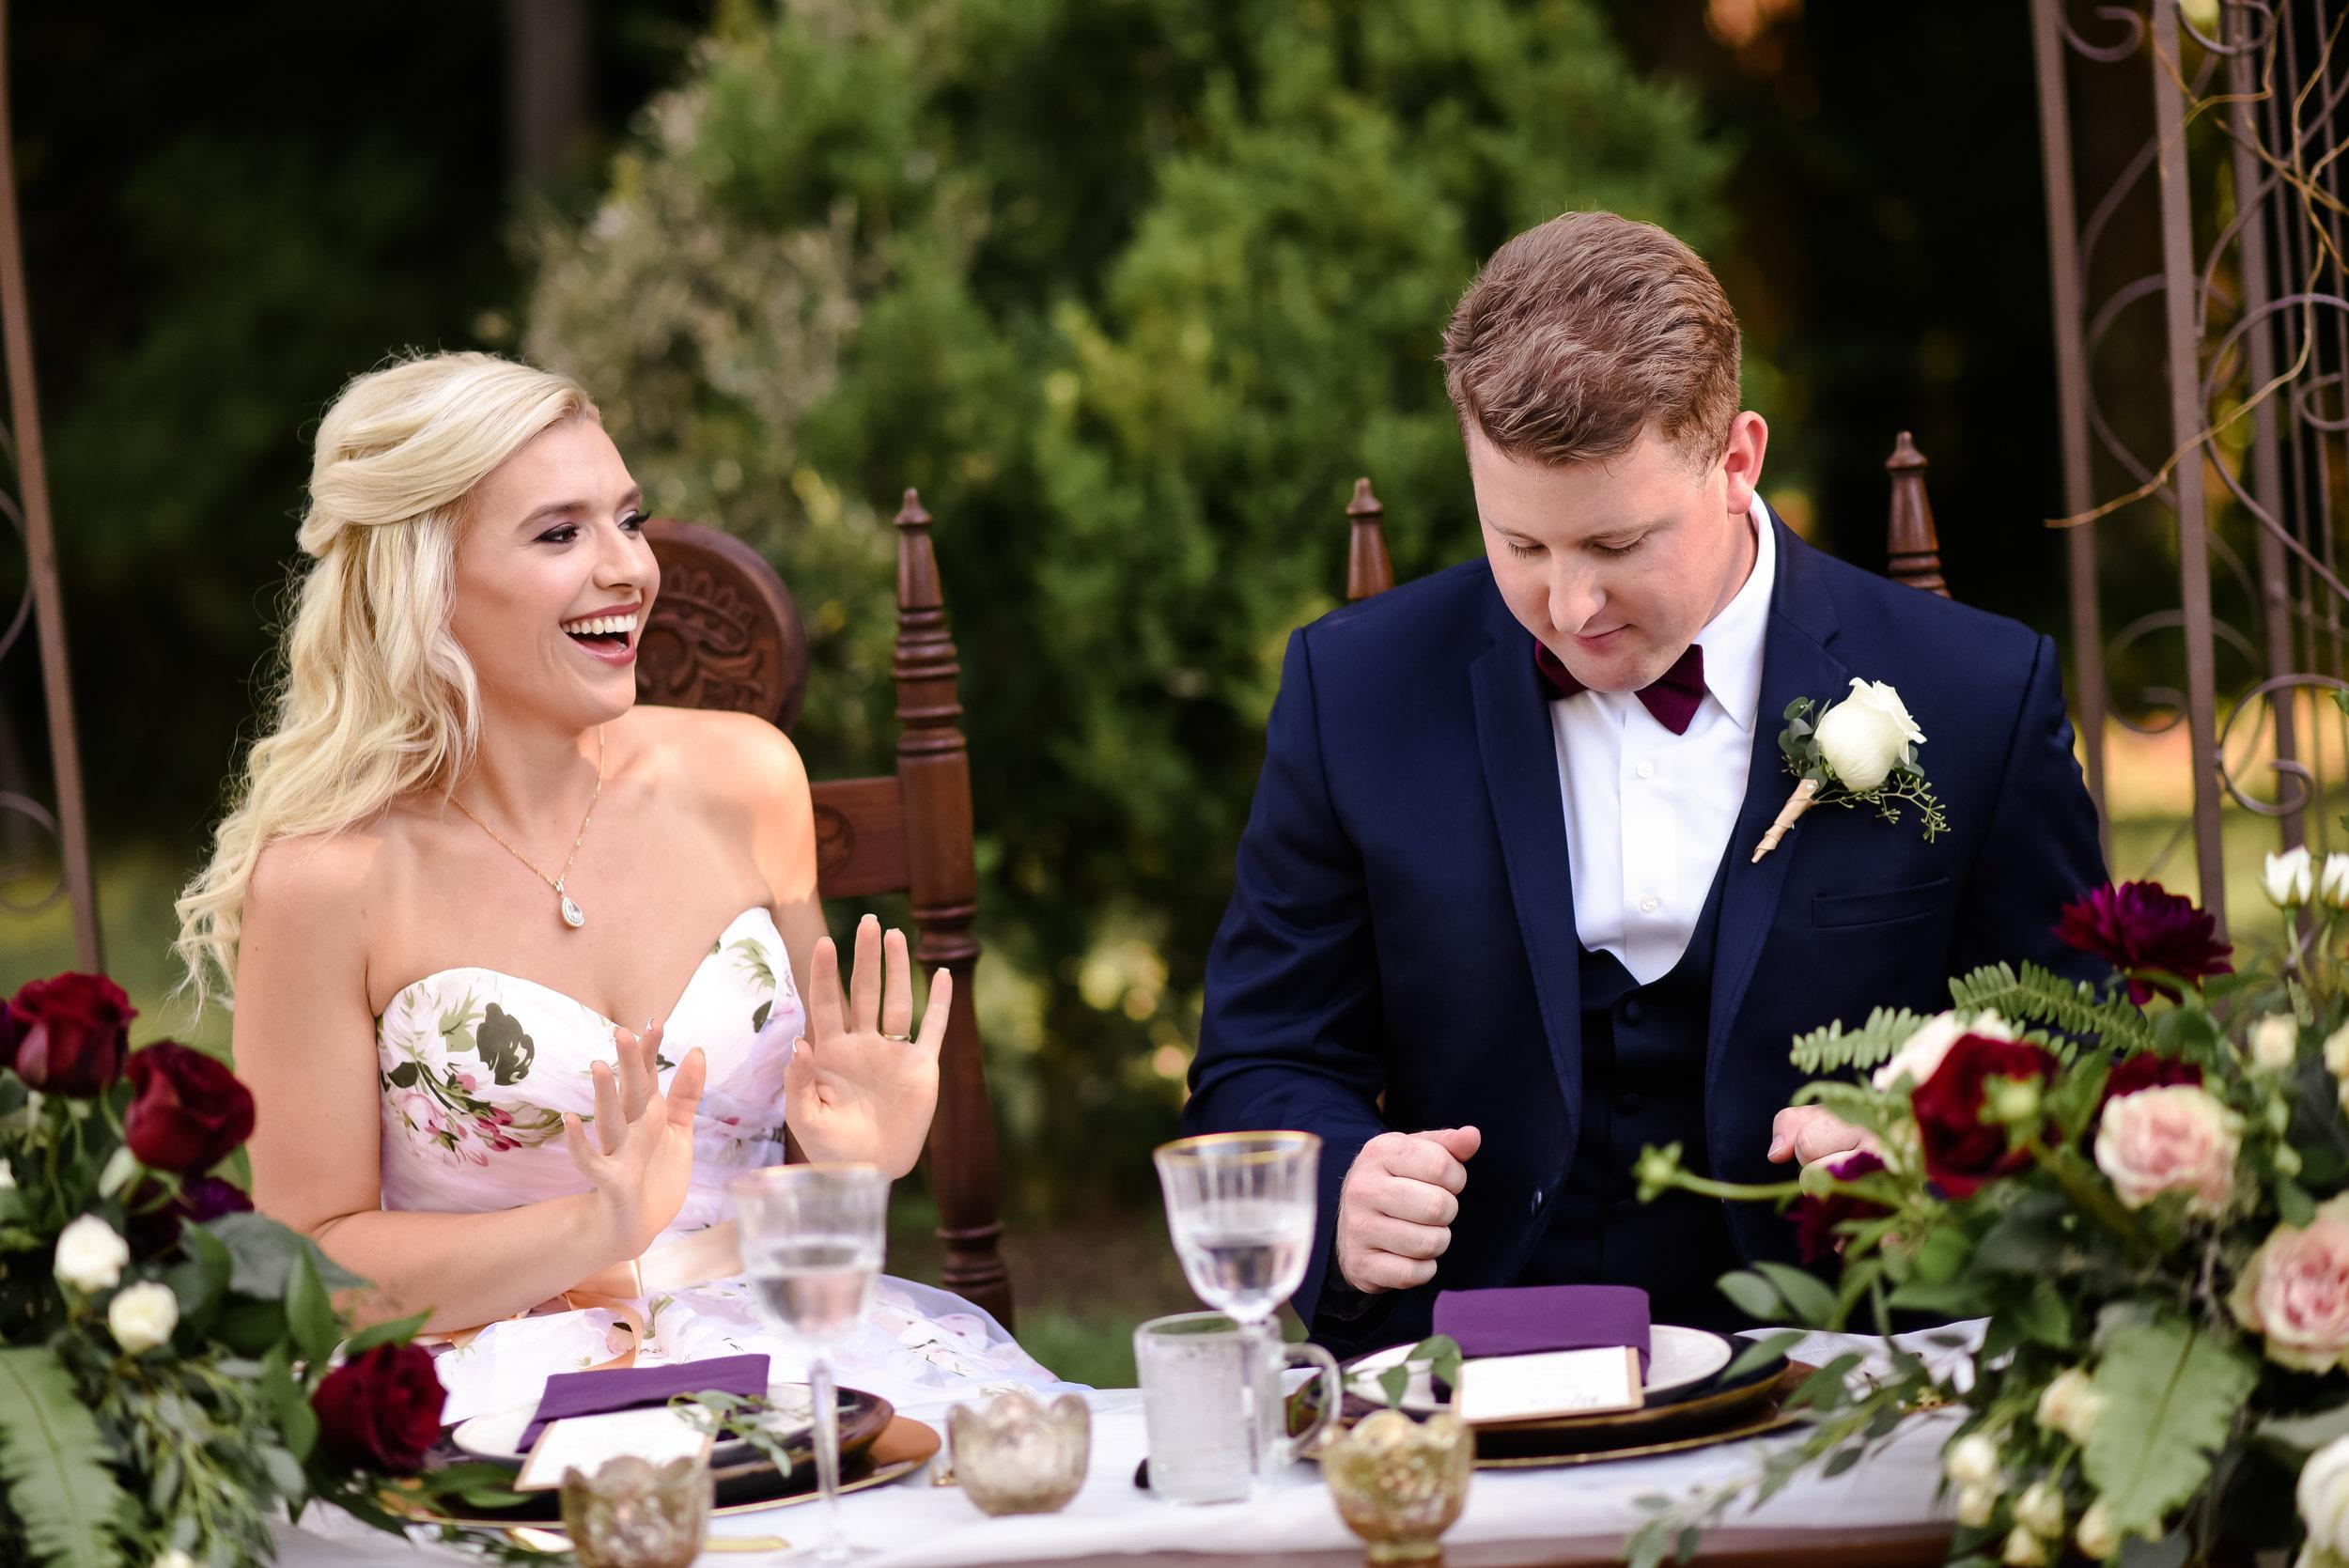 midsummers-eve-wedding-floral-blush-dress-david-tutera-cary-hill-plantation-photo-virginia-bride-145.jpg